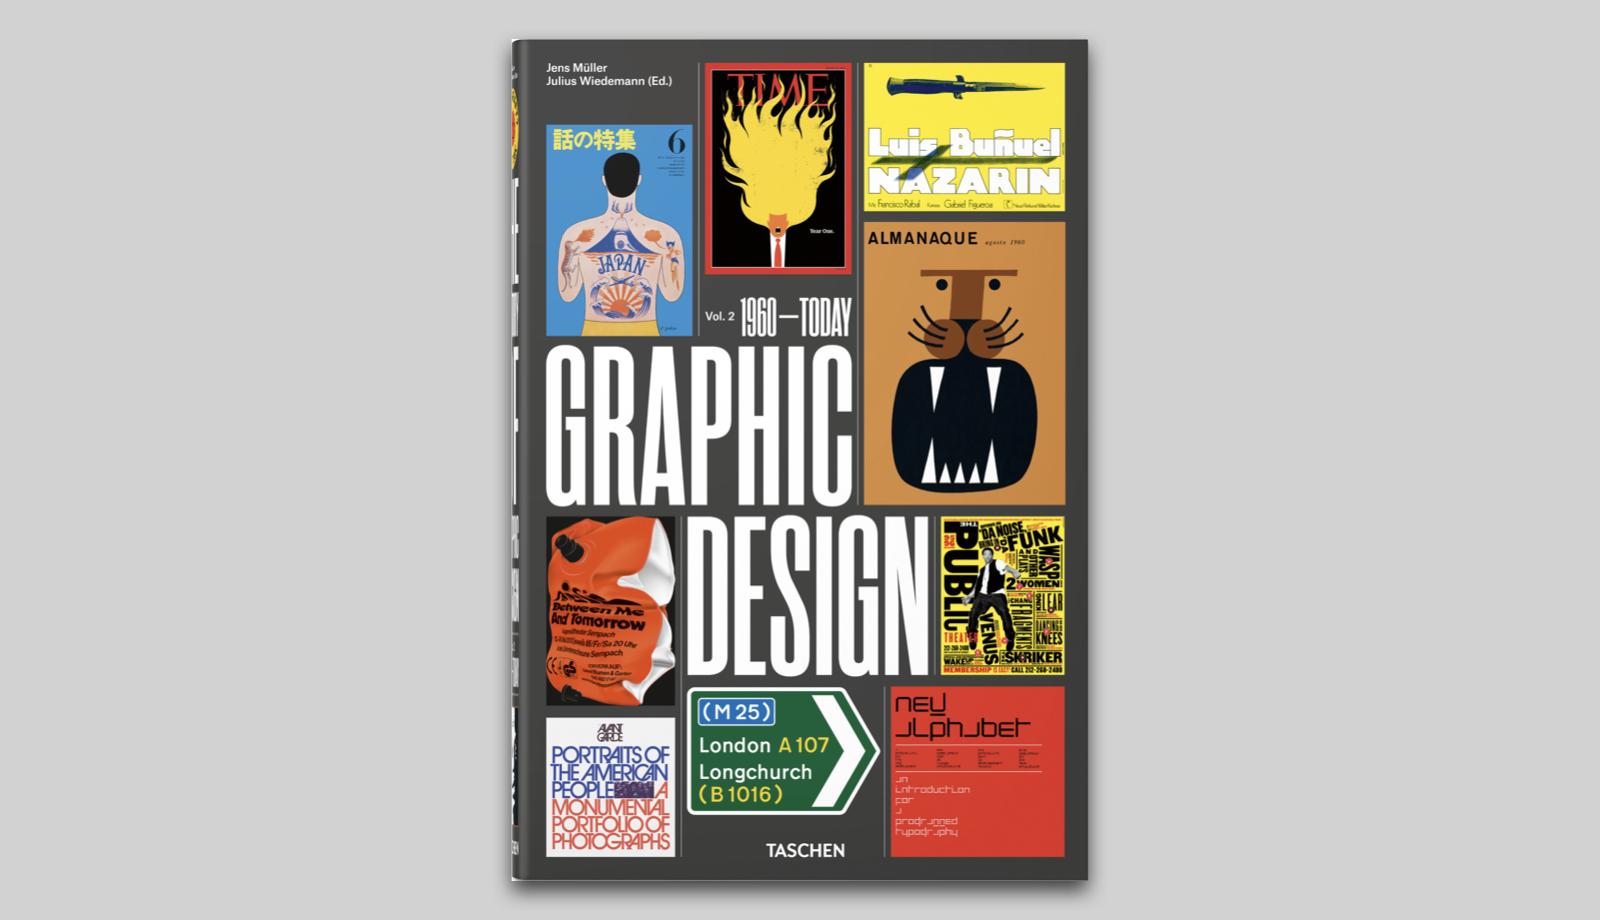 181005_Designkritik_ReneSpitz_WDR3-Mosaik_JensMueller_Grafikdesign1960-heute_11